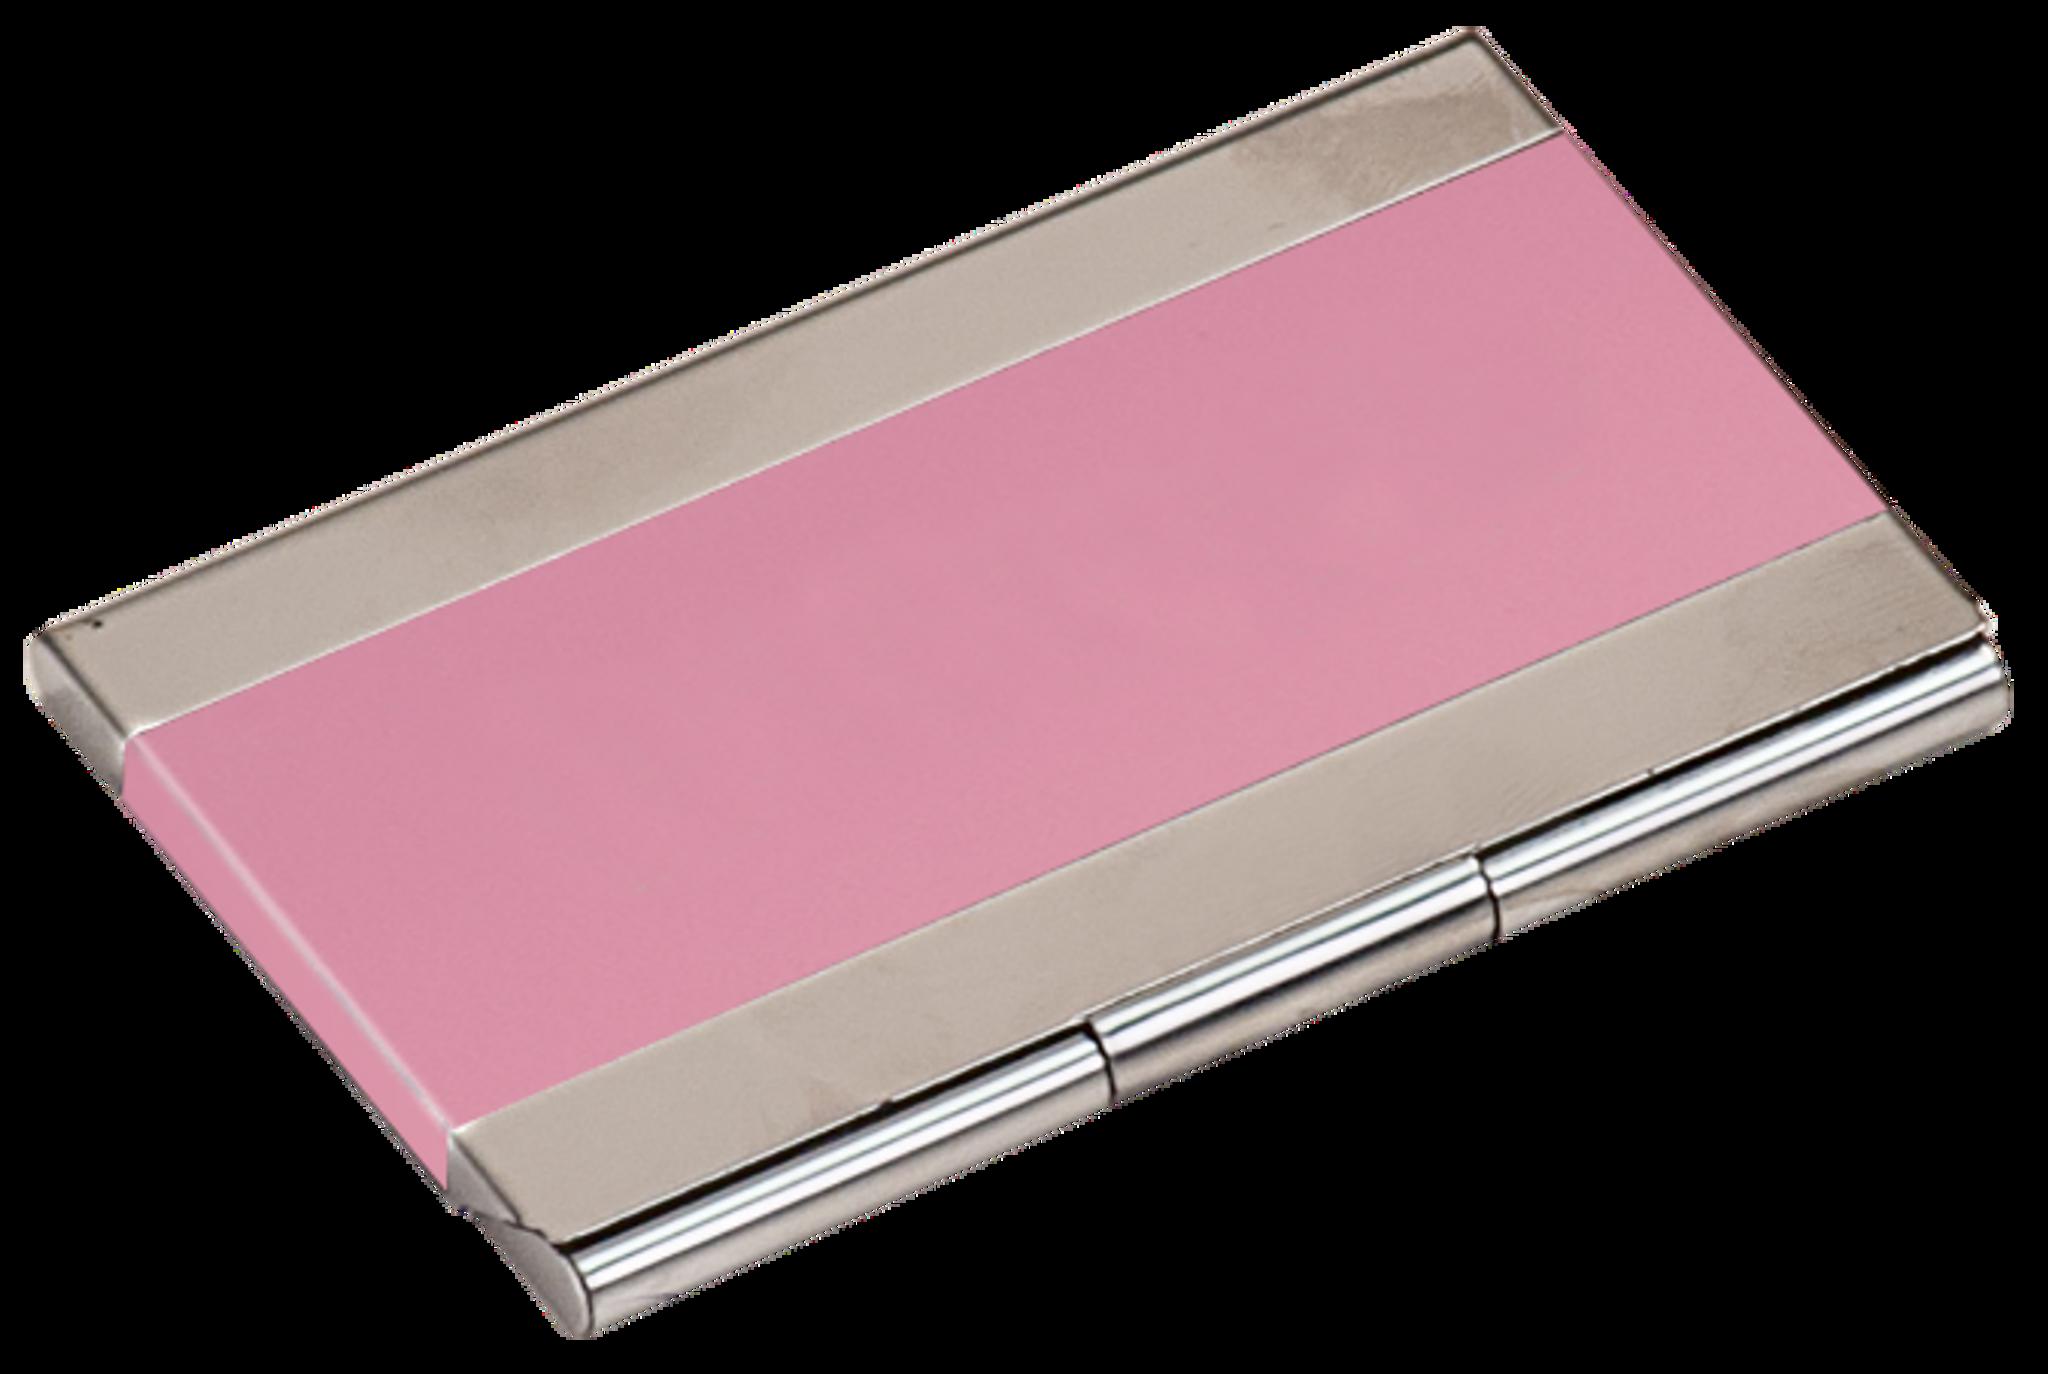 Pink metal business card holder jbs awards custom apparel pink metal business card holder colourmoves